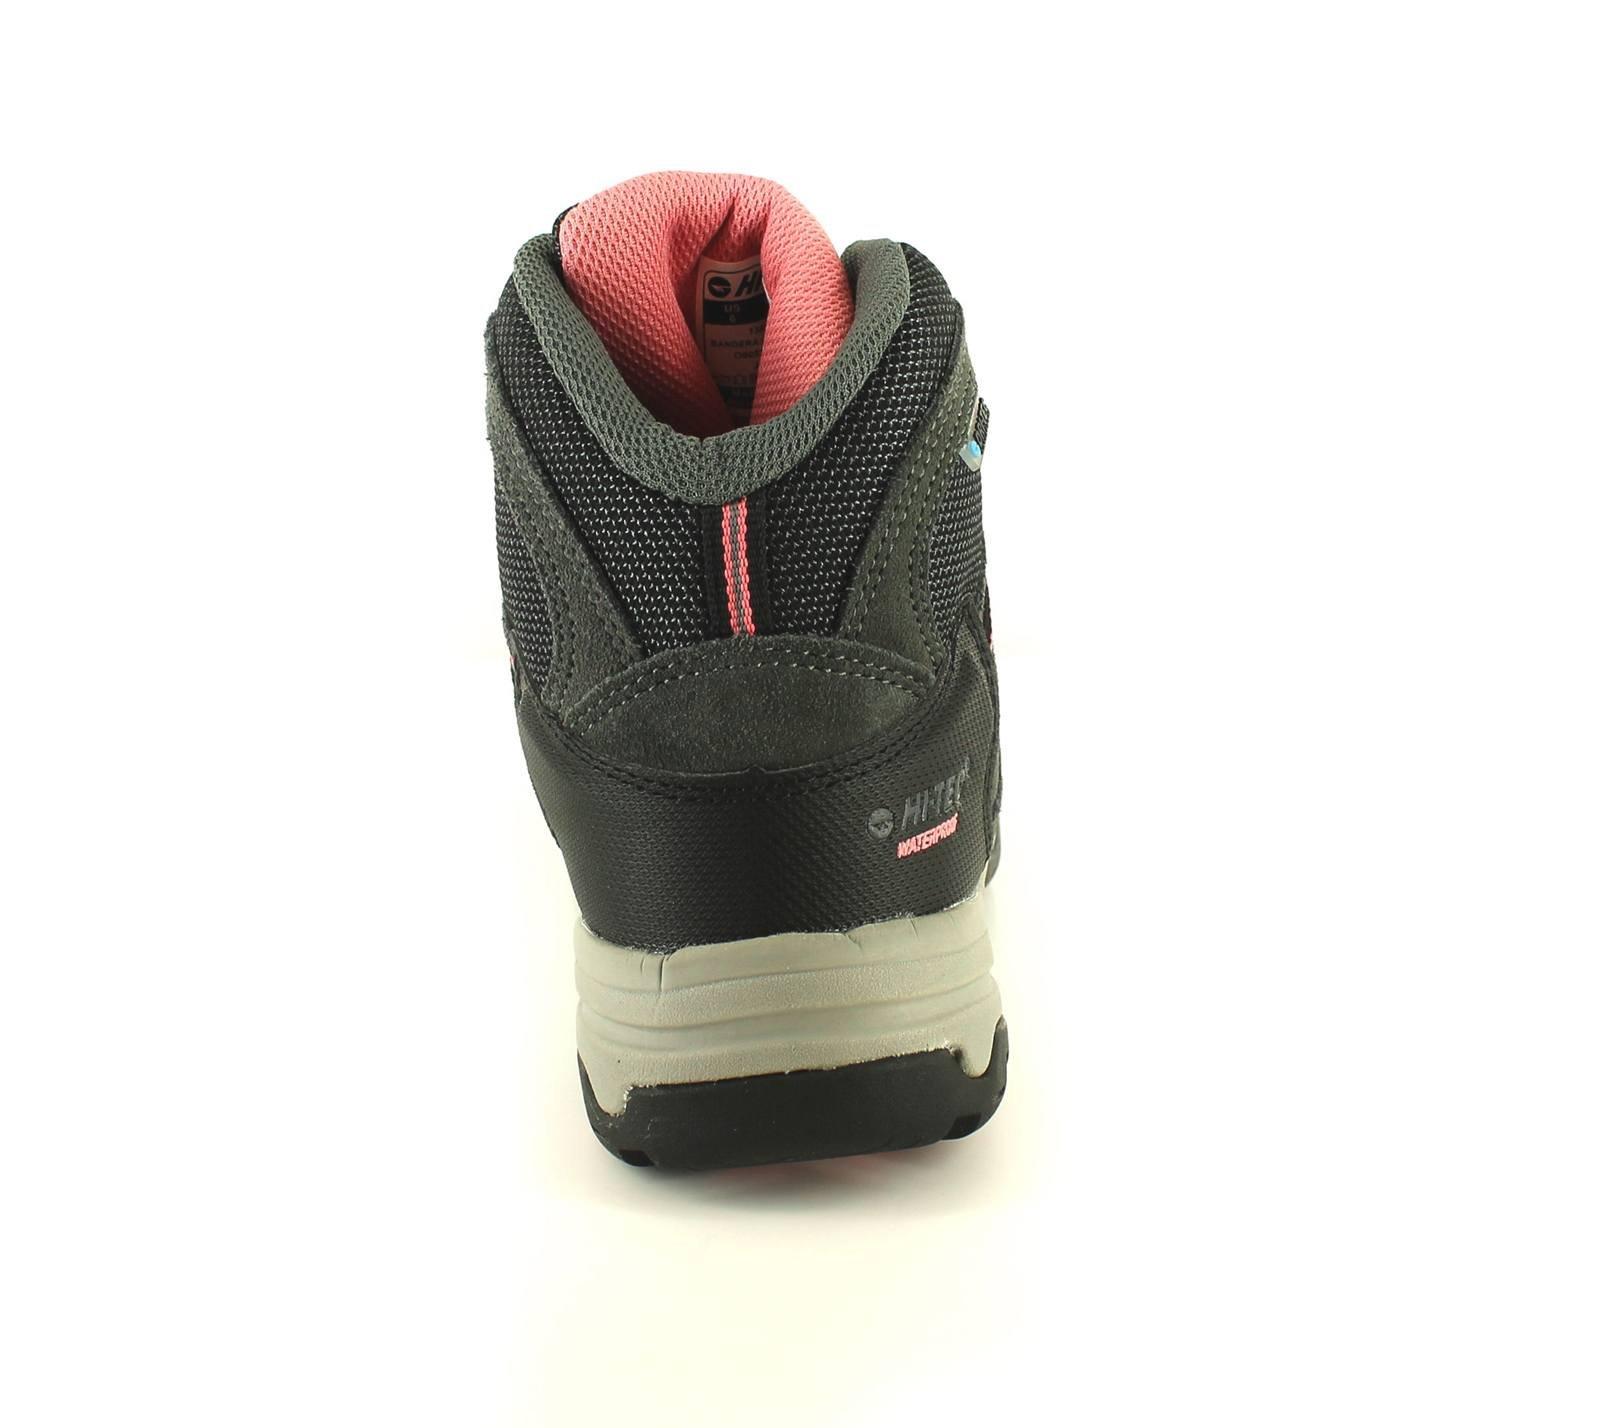 71vnfxhpsjL - Hi-Tec Bandera II Mid WP Women's Walking Shoes